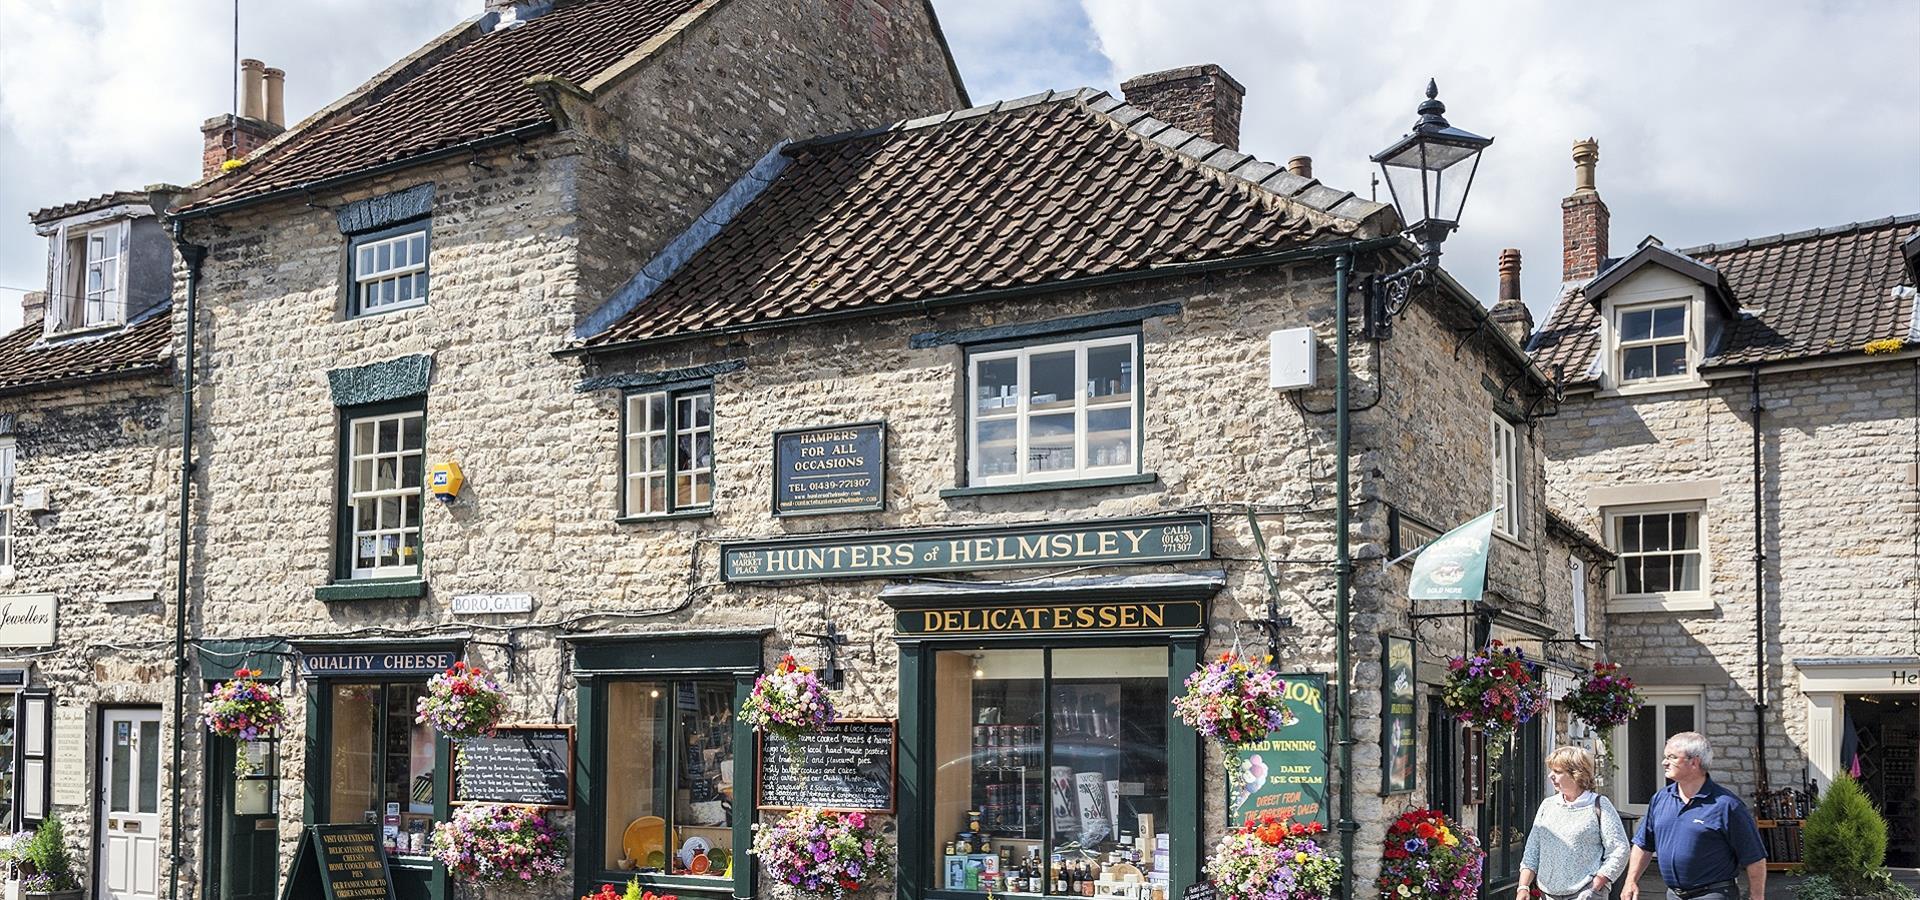 An image of Helmsley by Richard Burdon